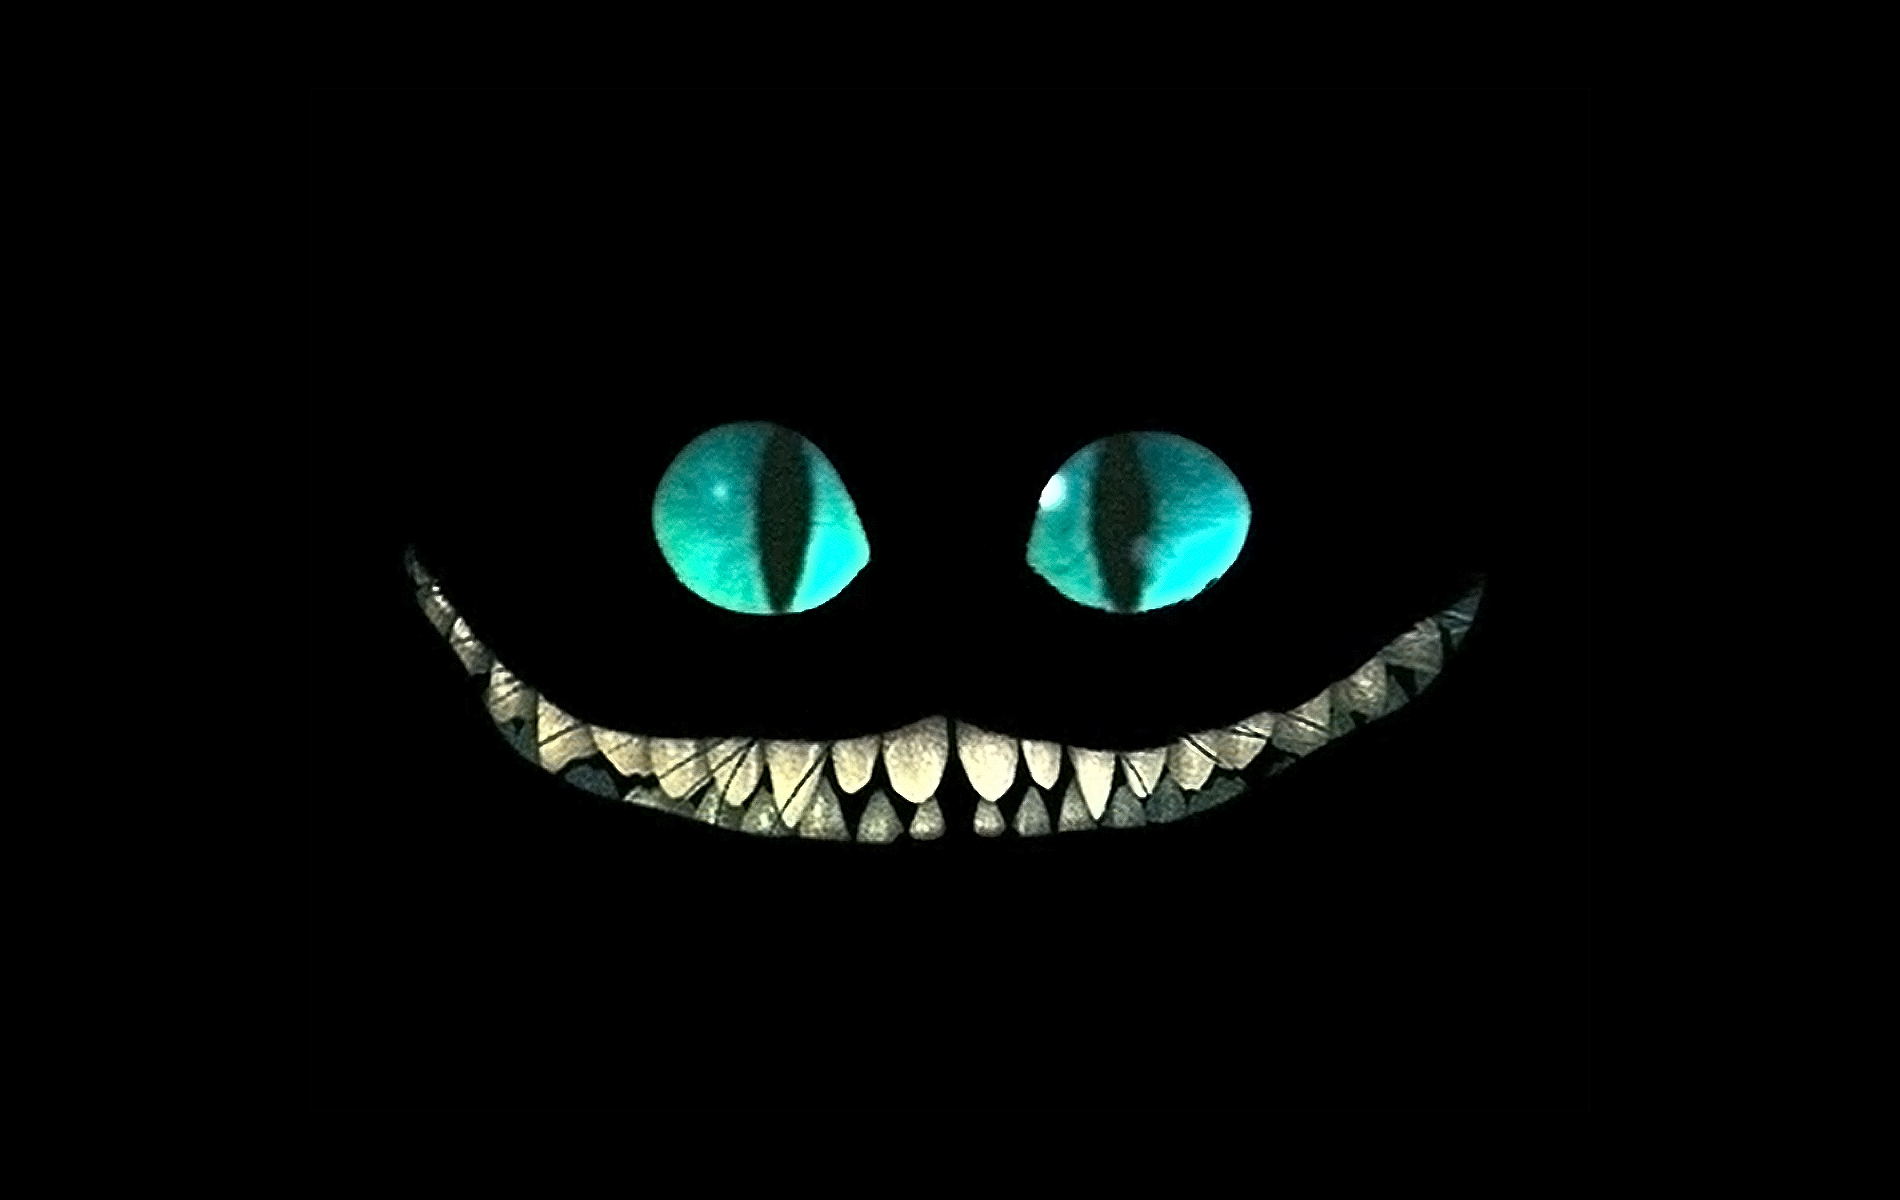 Download Cheshire Cat Wallpaper 1900x1200 Wallpoper 424715 1900x1200